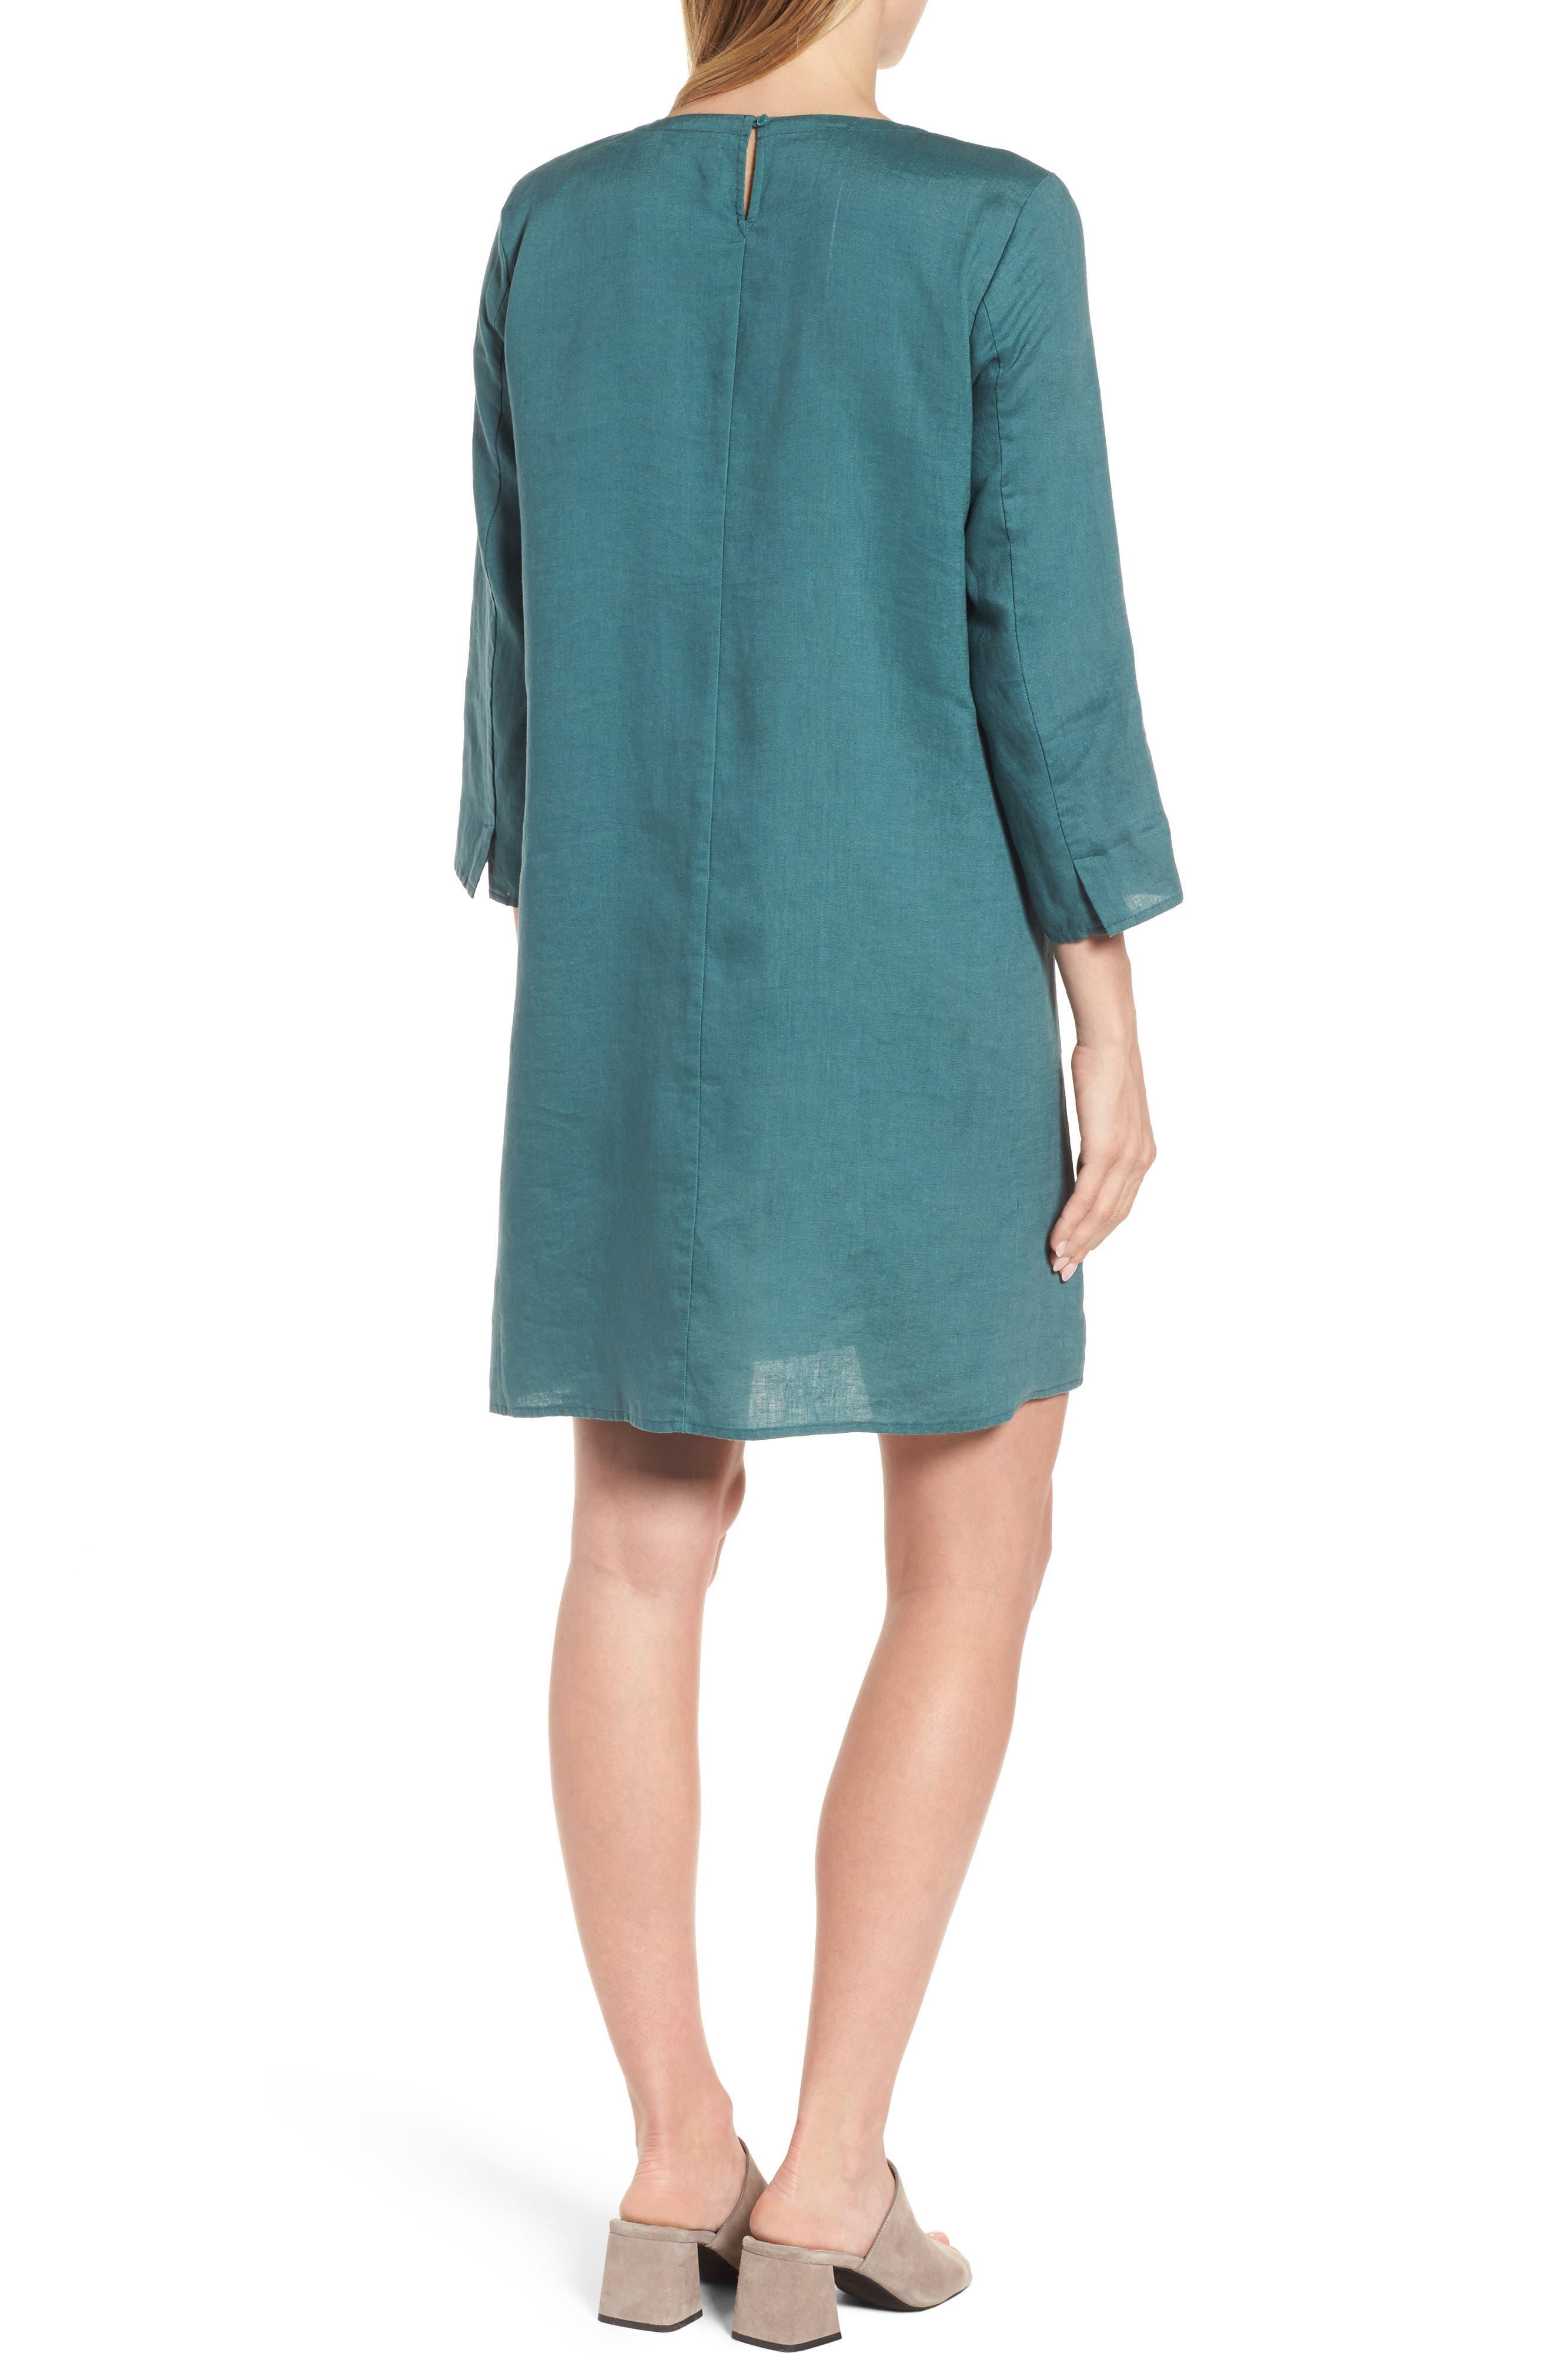 Organic Linen Round Neck Shift Dress,                             Alternate thumbnail 2, color,                             Dragonfly